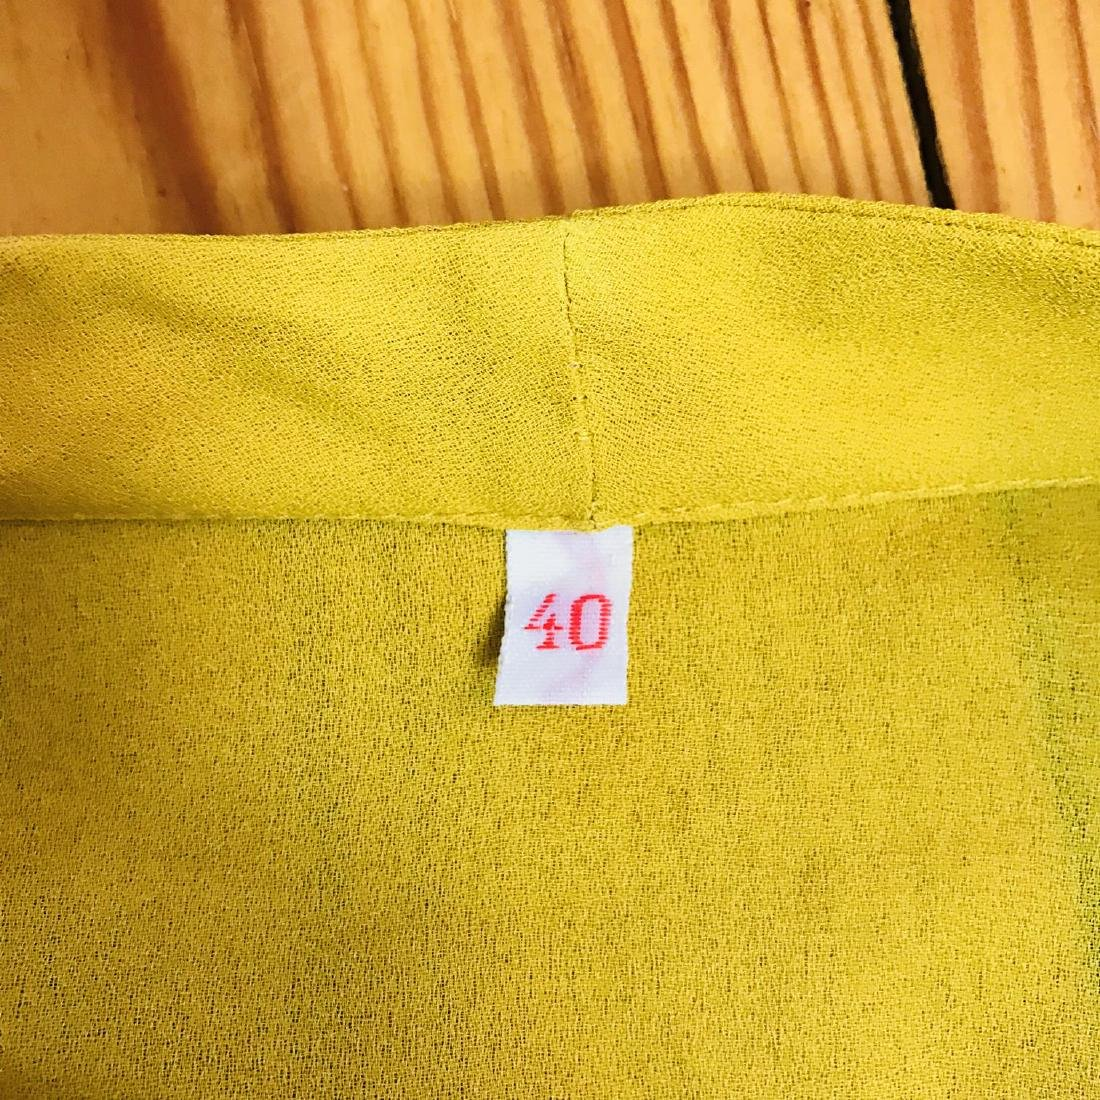 Vintage Women's Yellow Blouse Shirt Top Size EUR 40 US - 5